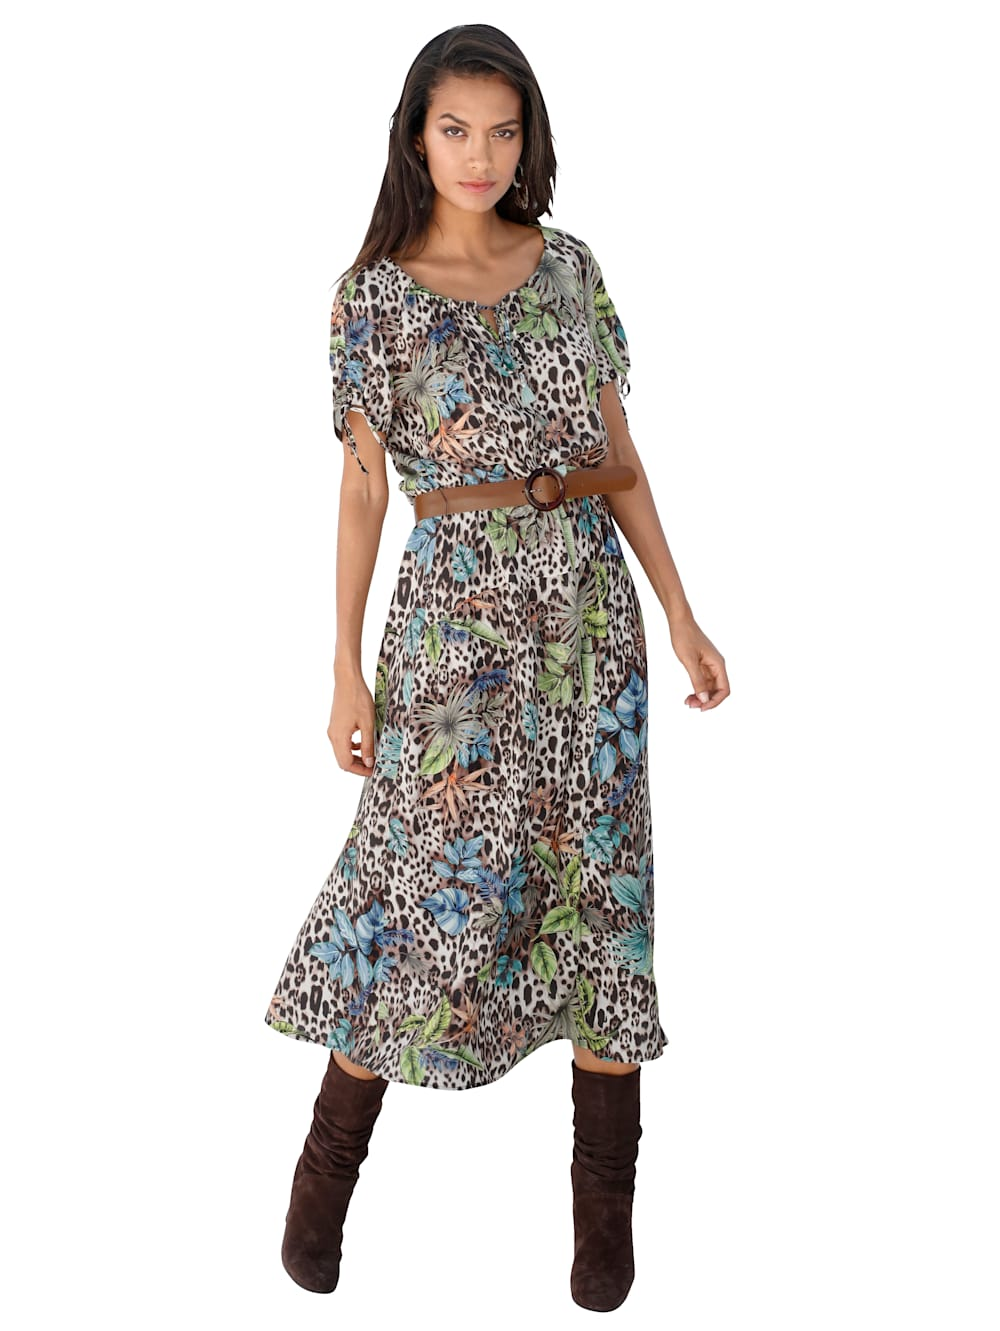 betty barclay kleid mit gürtel | wenz